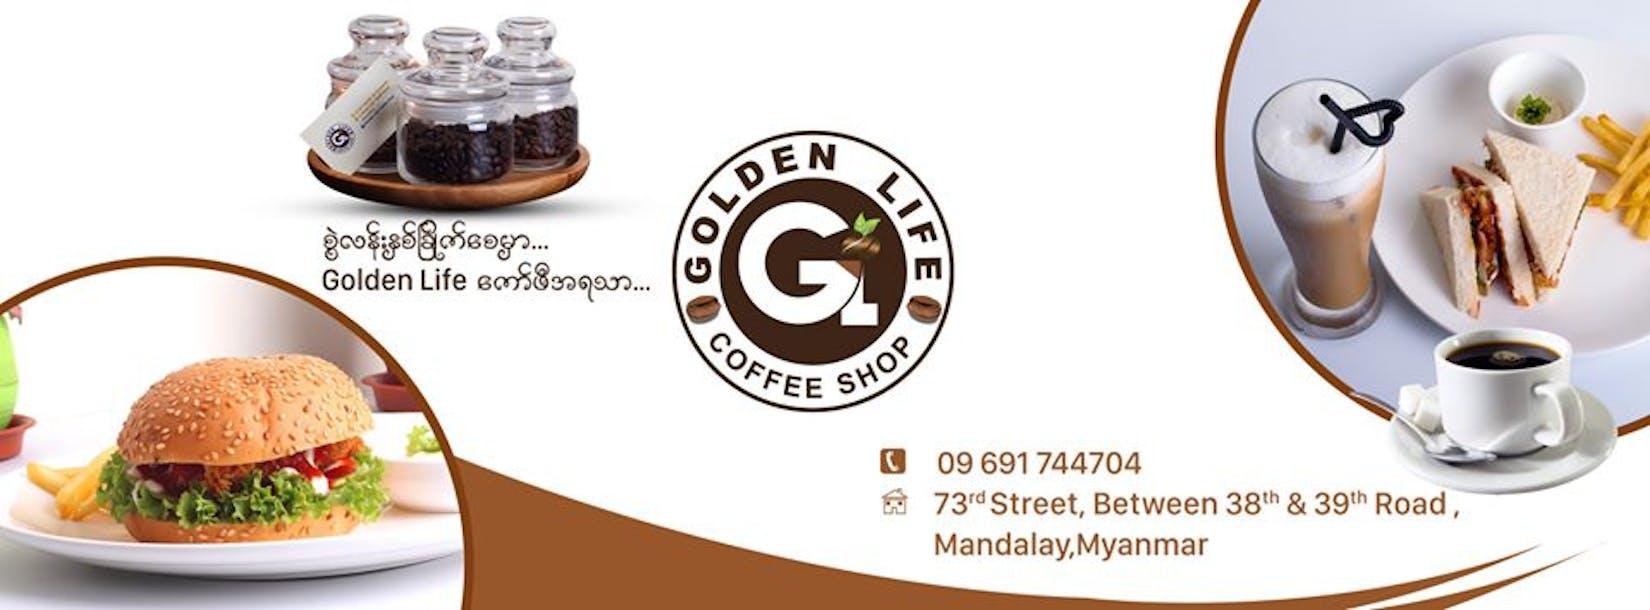 Golden Life Coffee Shop | yathar